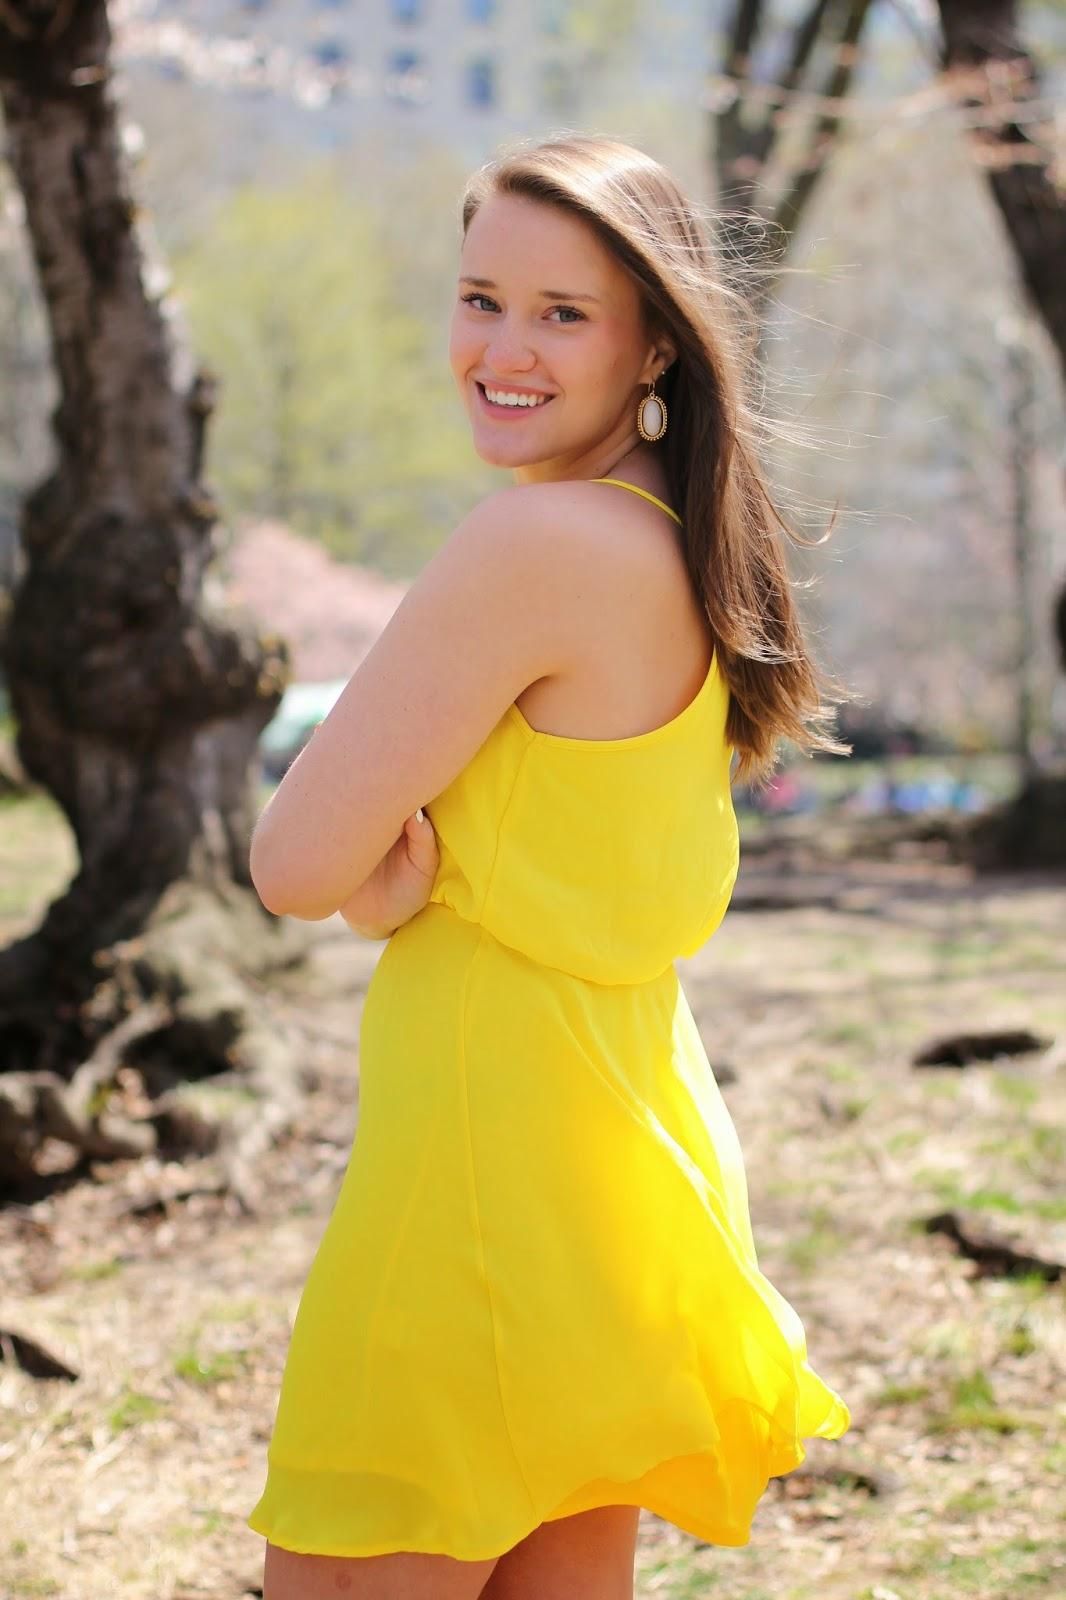 krista robertson, fashion blogger, nyc fashion blogger, southern blogger